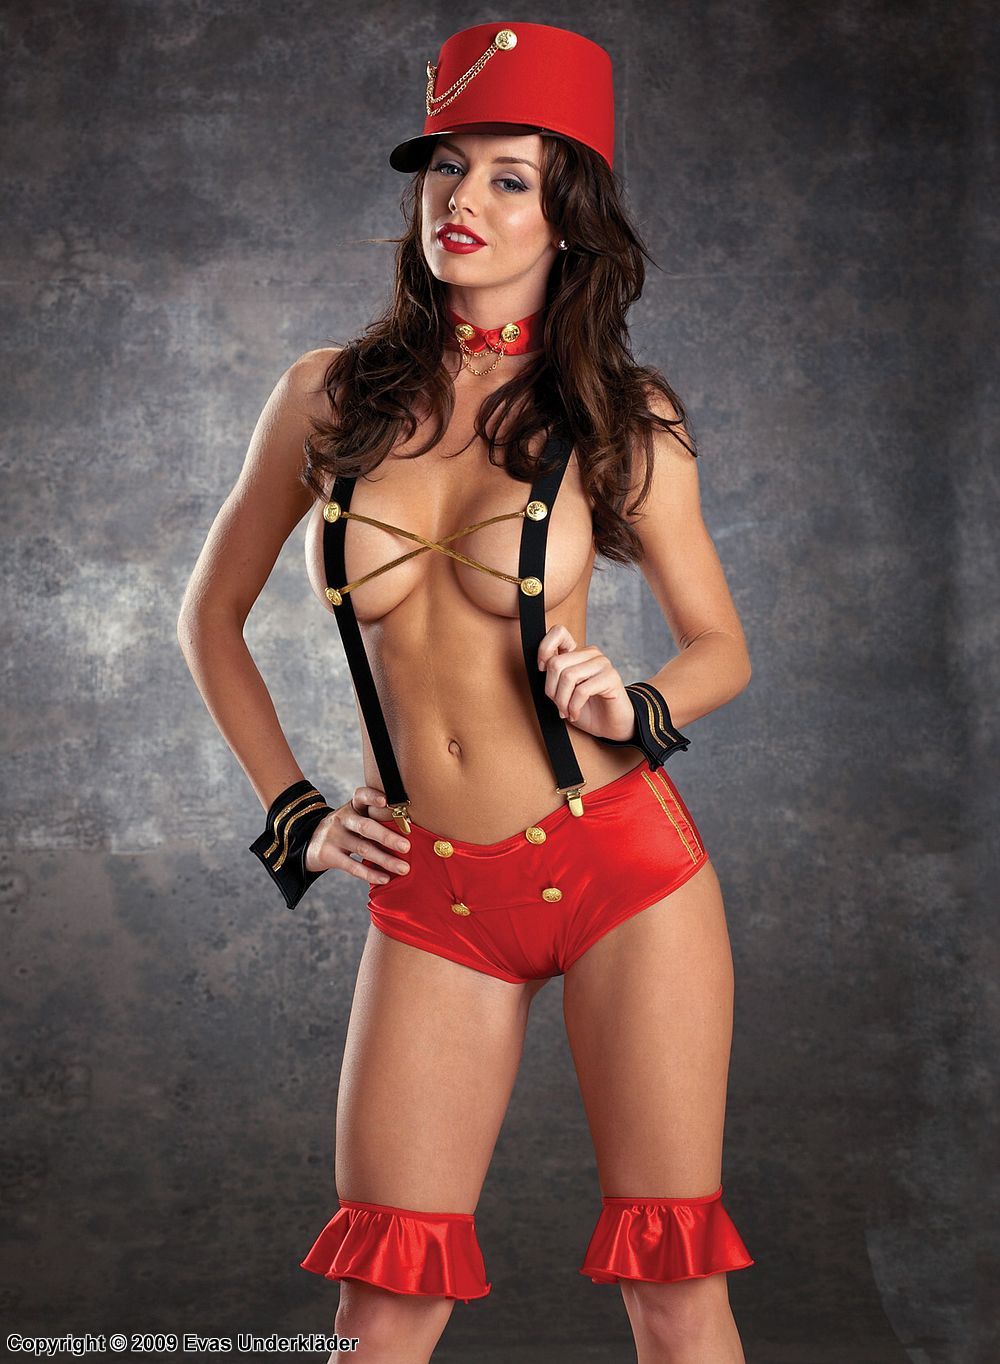 секси стриптиз в костюме хорошо массирут